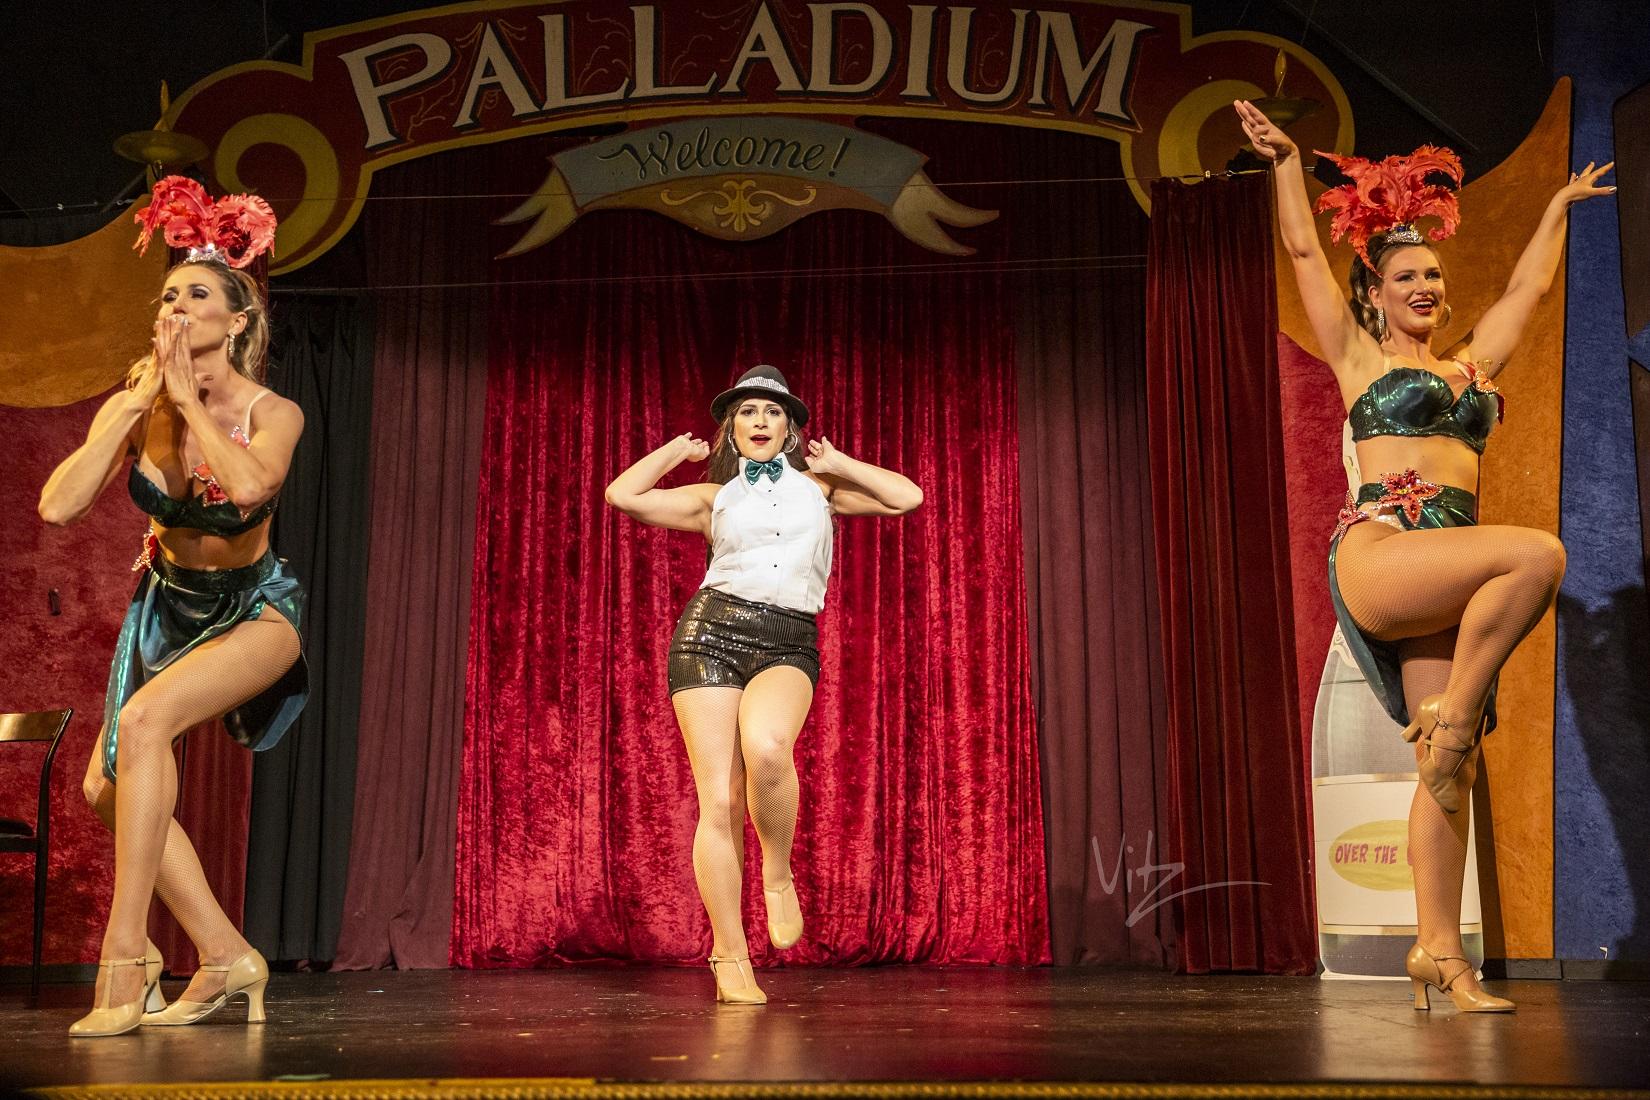 Seattle showgirls